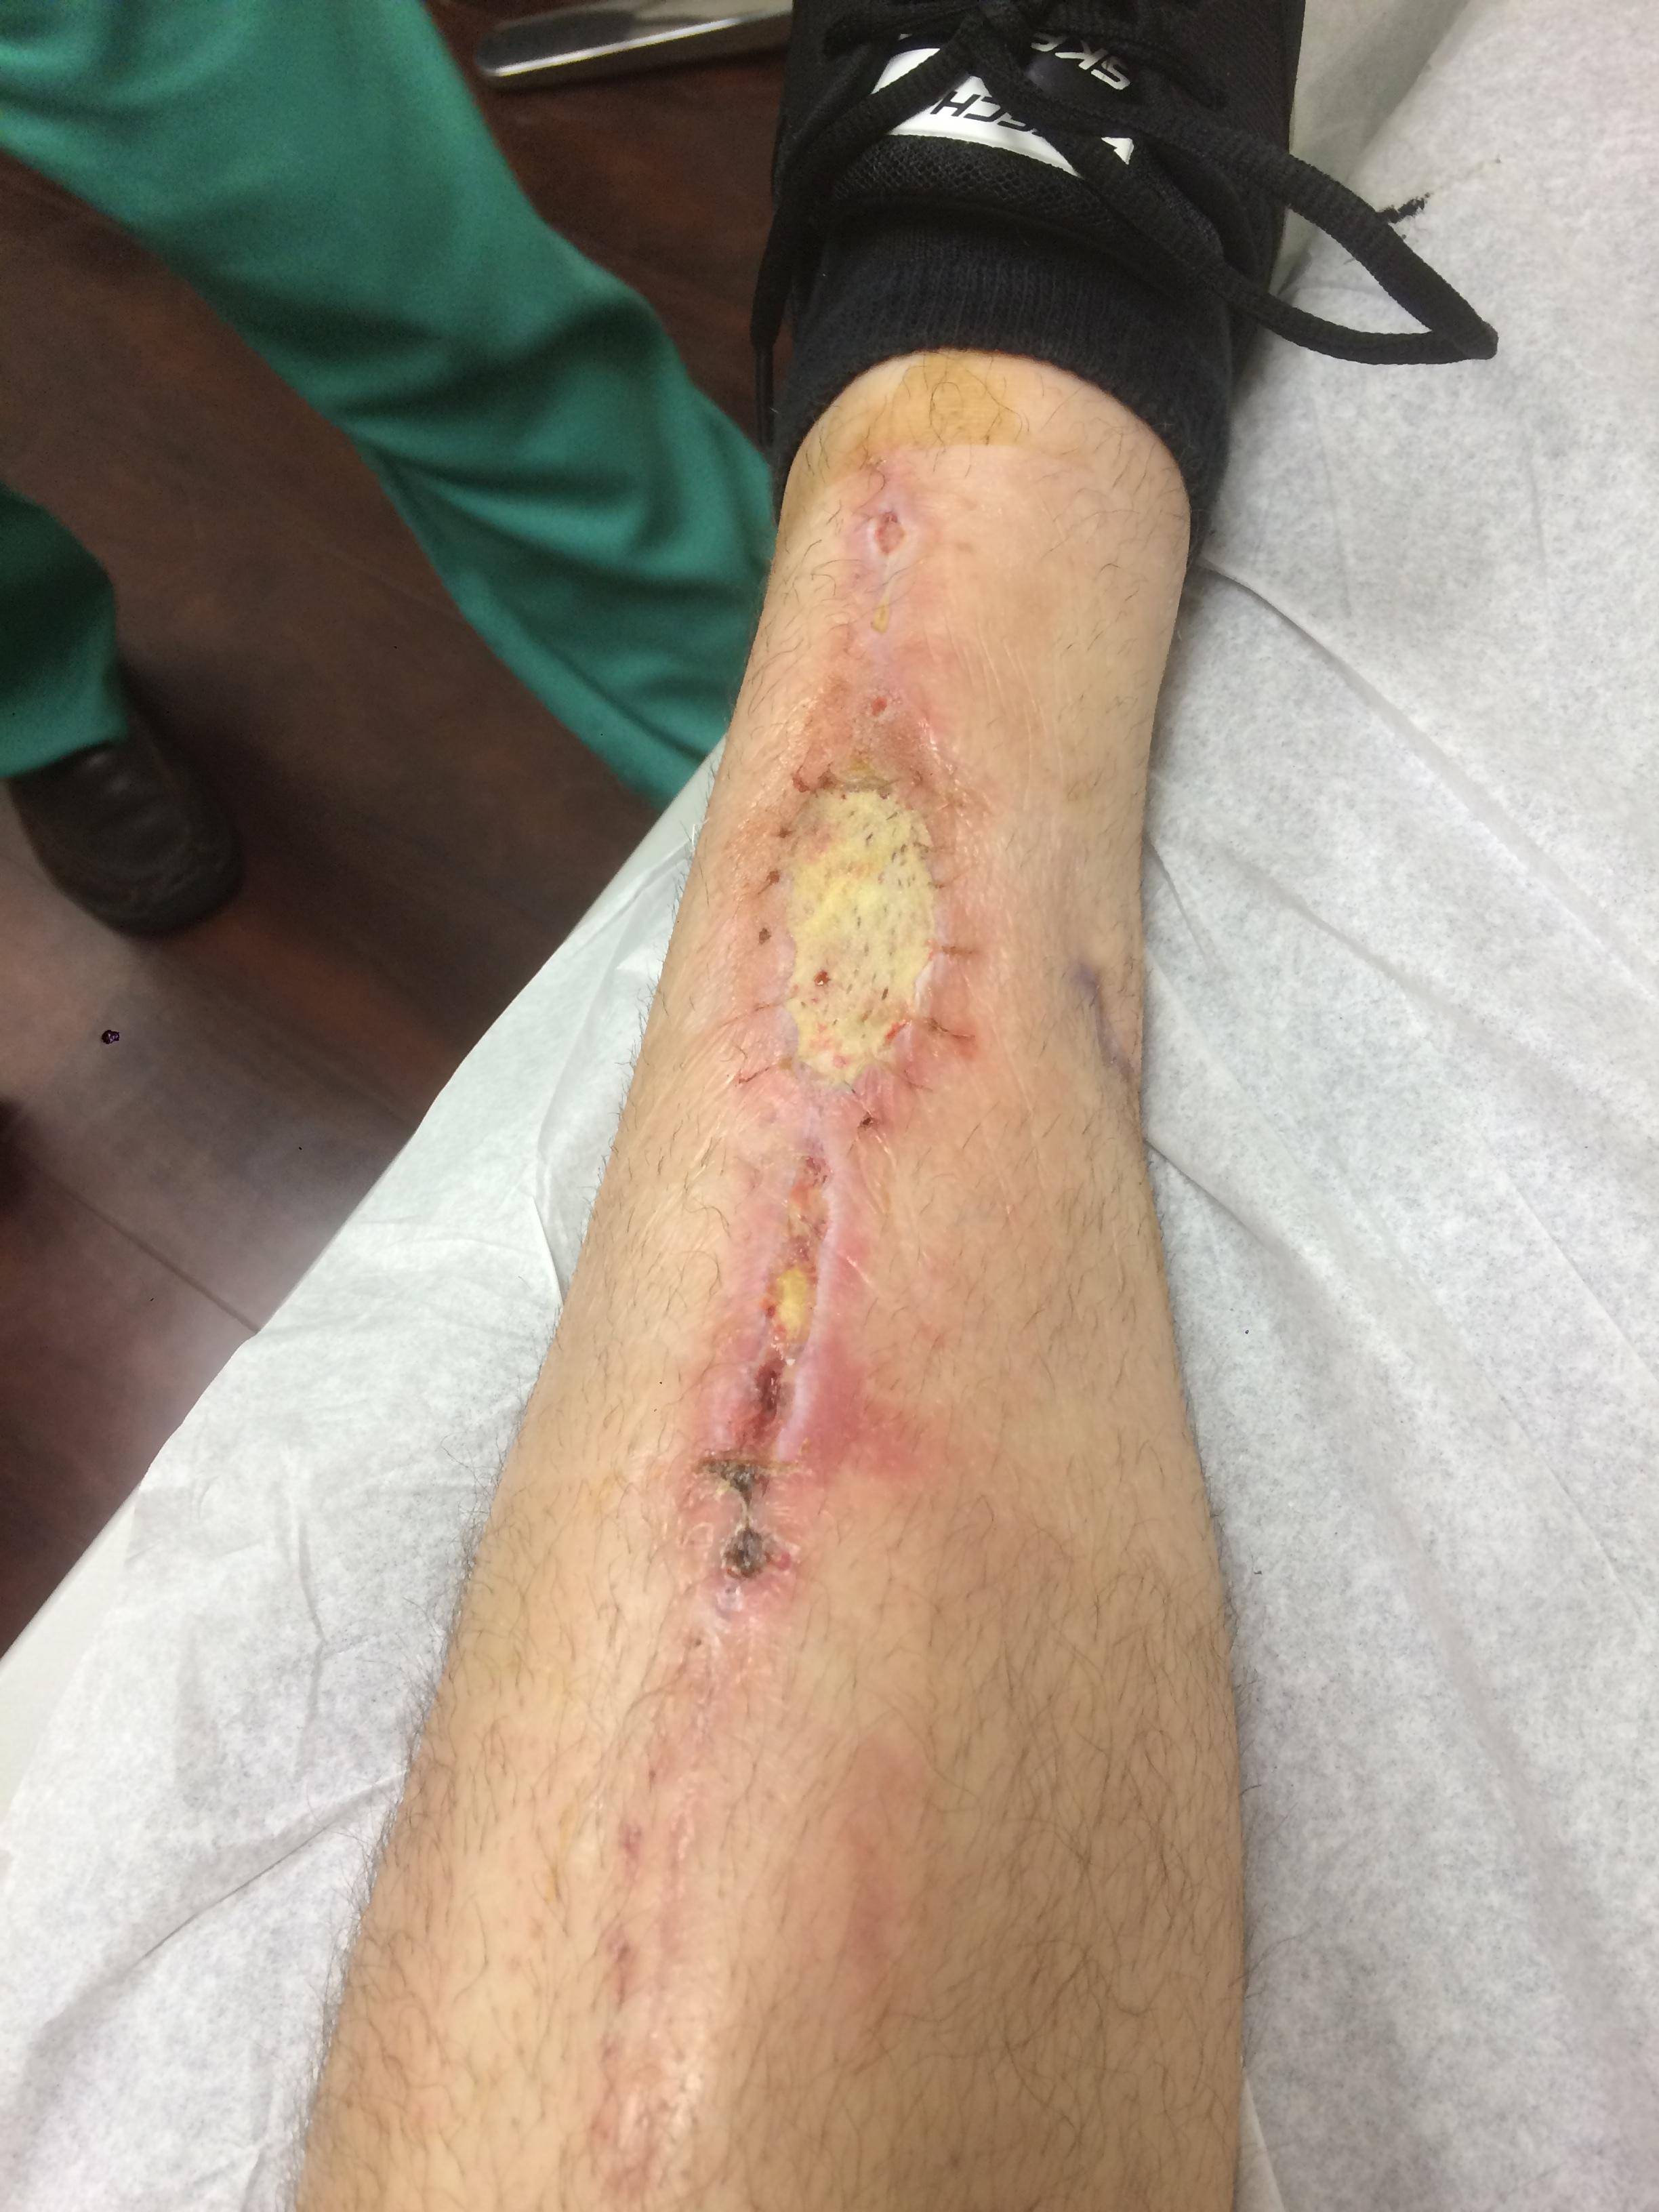 Incision site after skin graft.